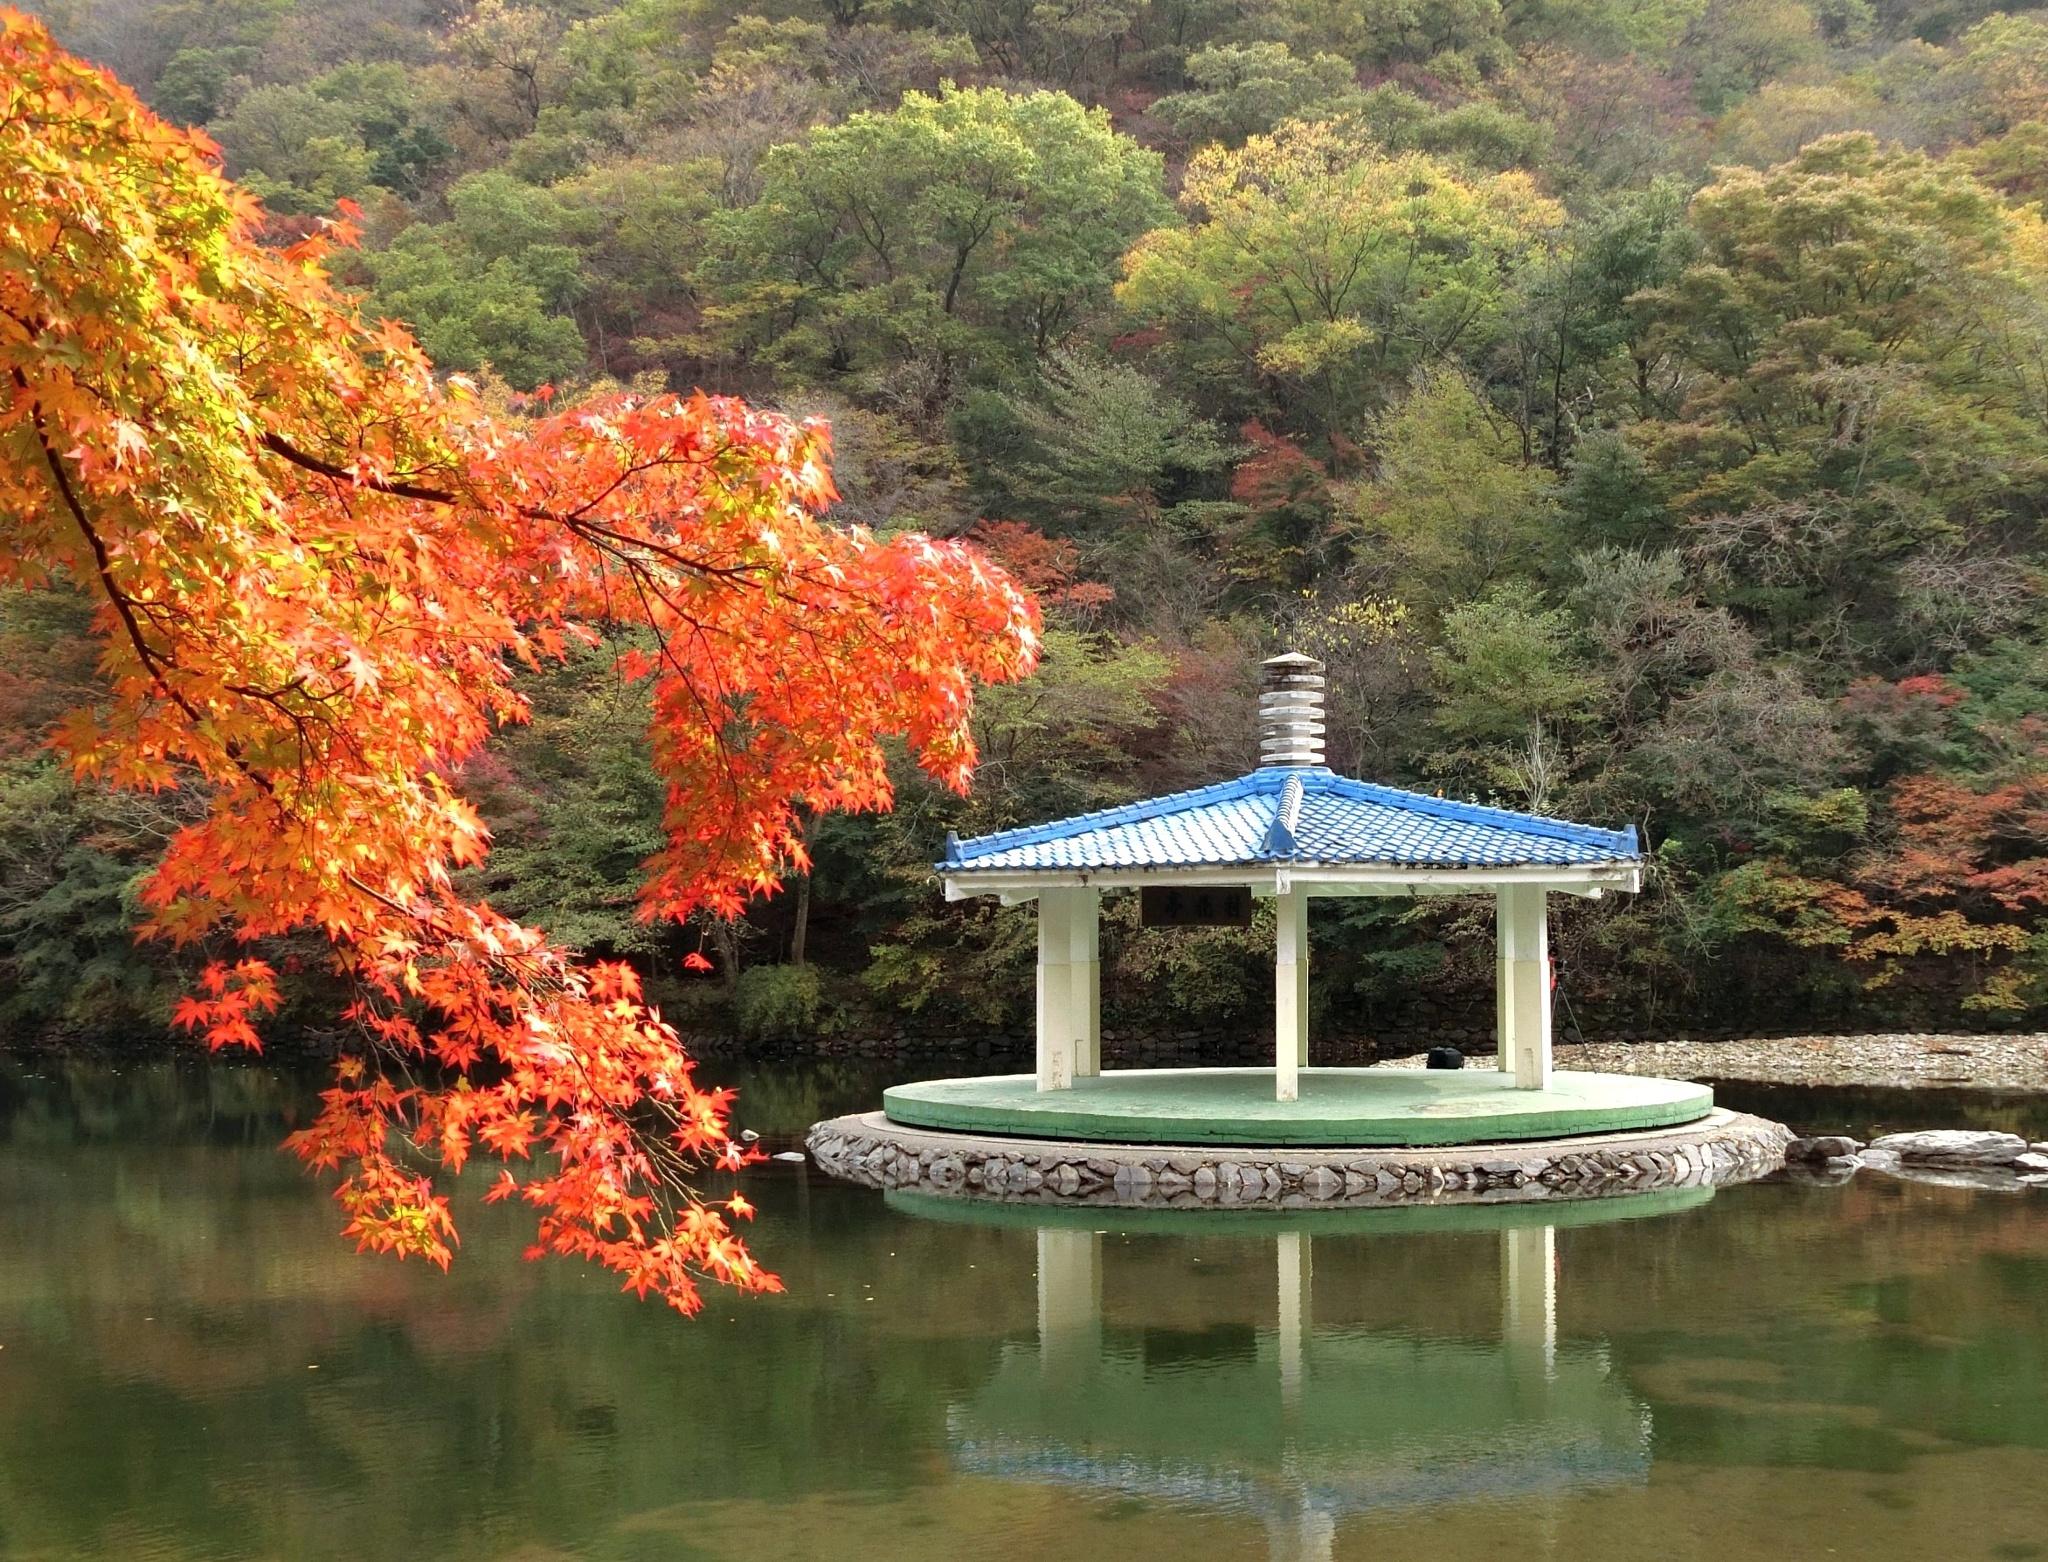 Naejangsan-4, S. Korea by pop88123